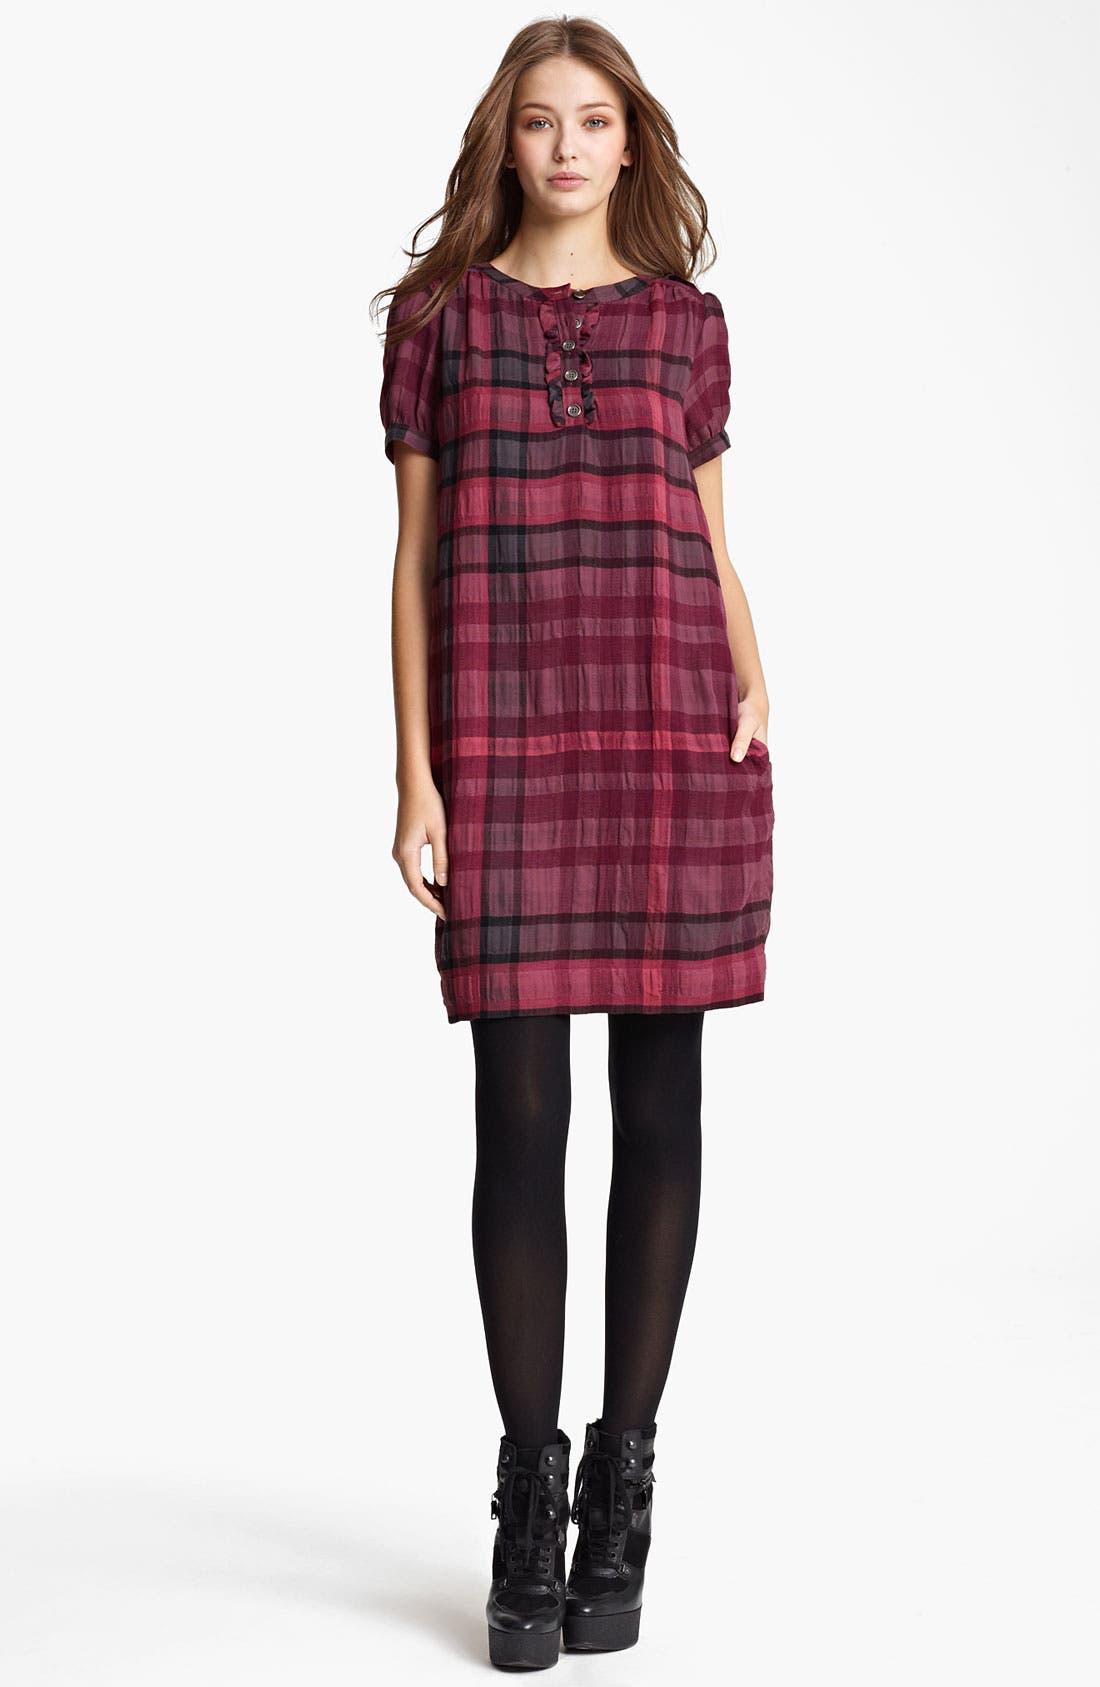 Alternate Image 1 Selected - Burberry Brit Check Print Dress